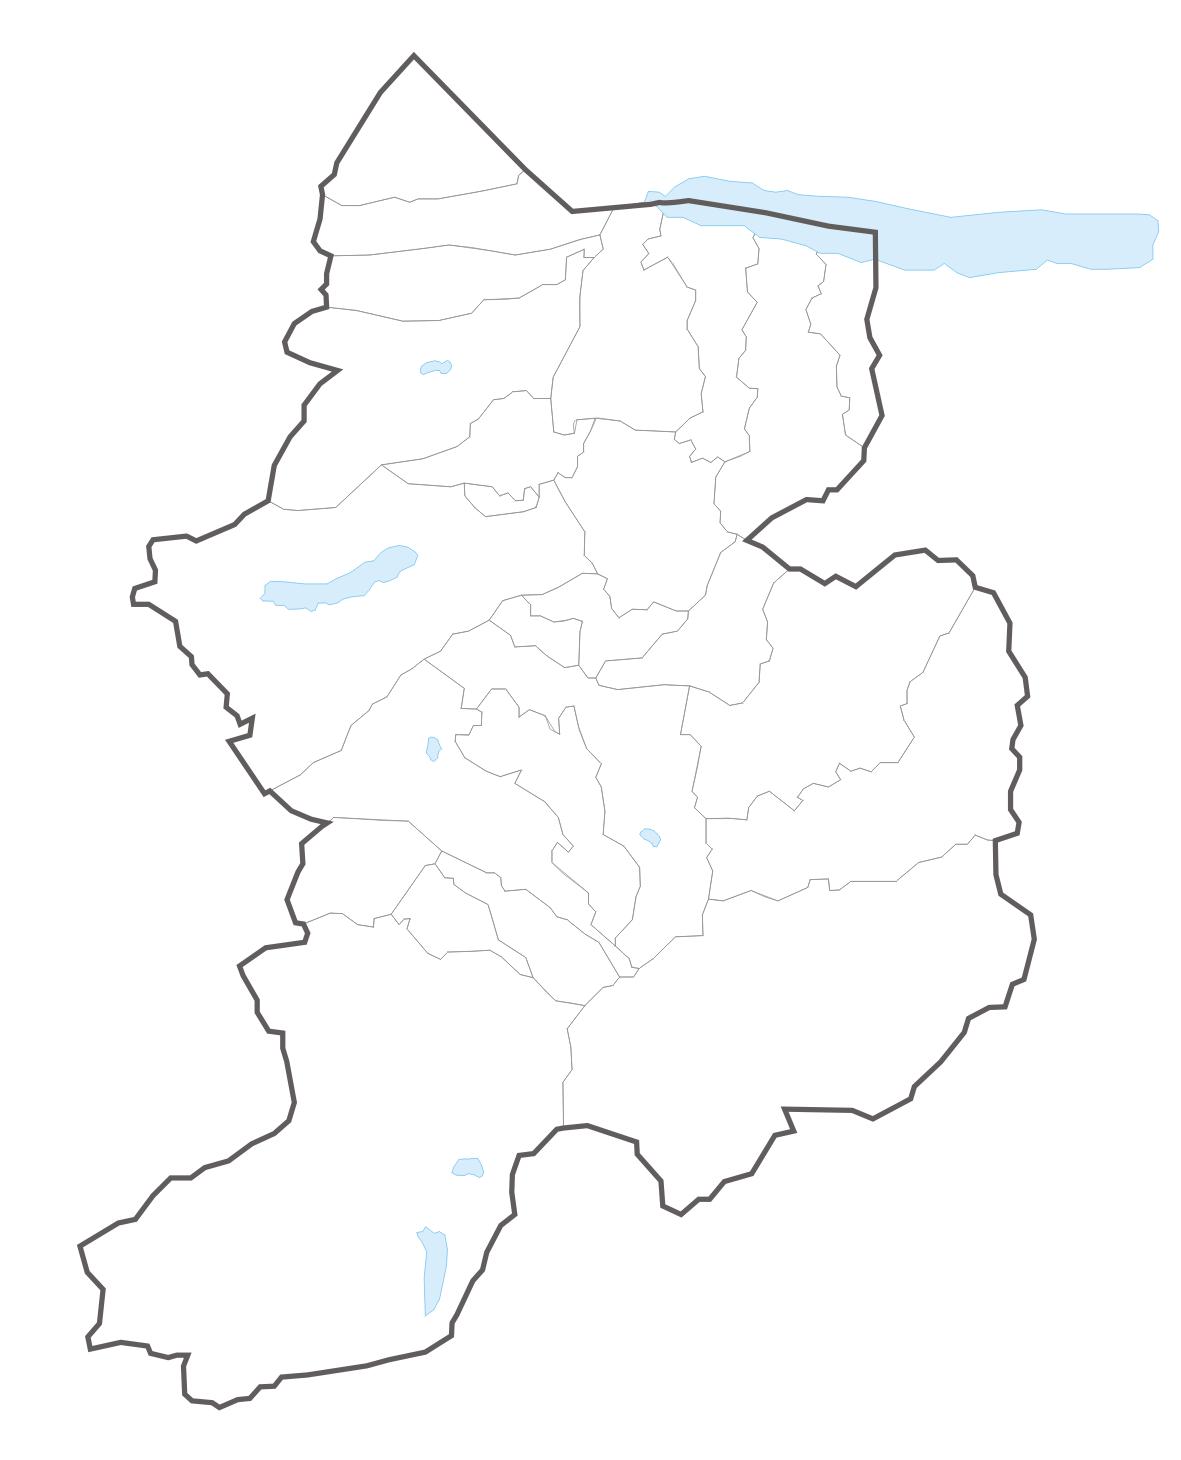 FileKarte Gemeinden des Kantons Glarus 2007 blankpng Wikimedia